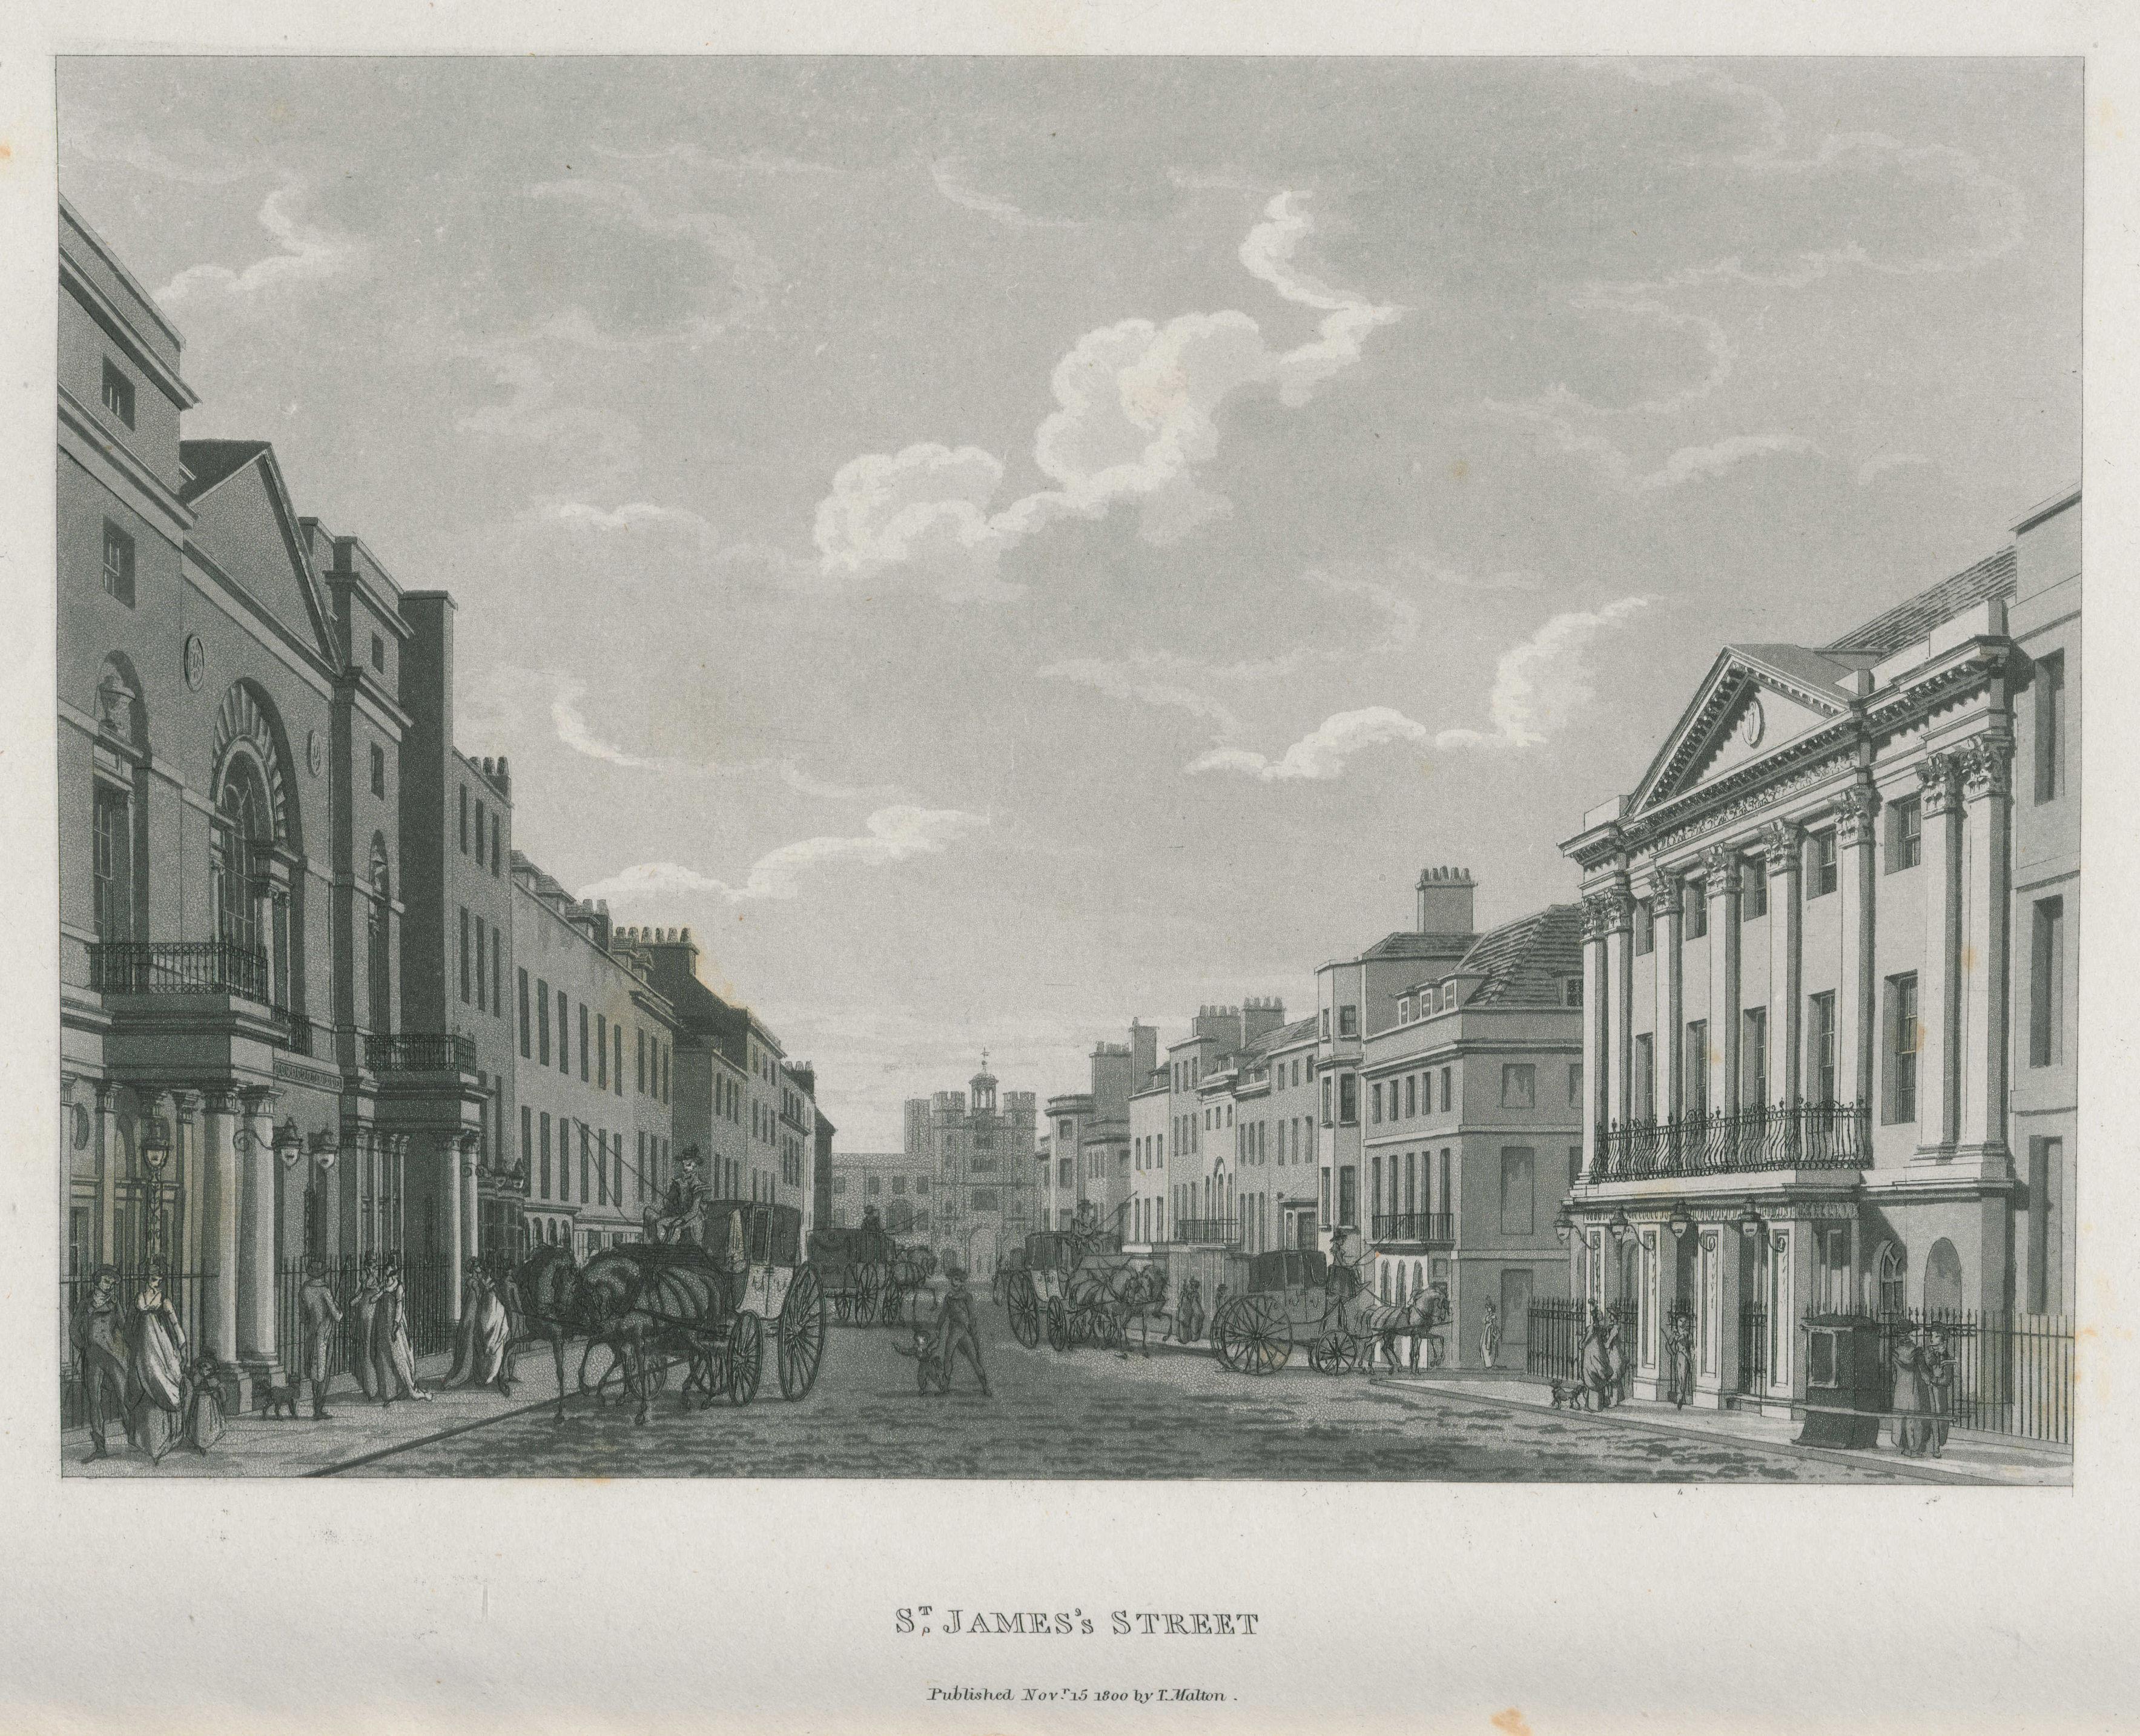 094 - Malton - St James's Street